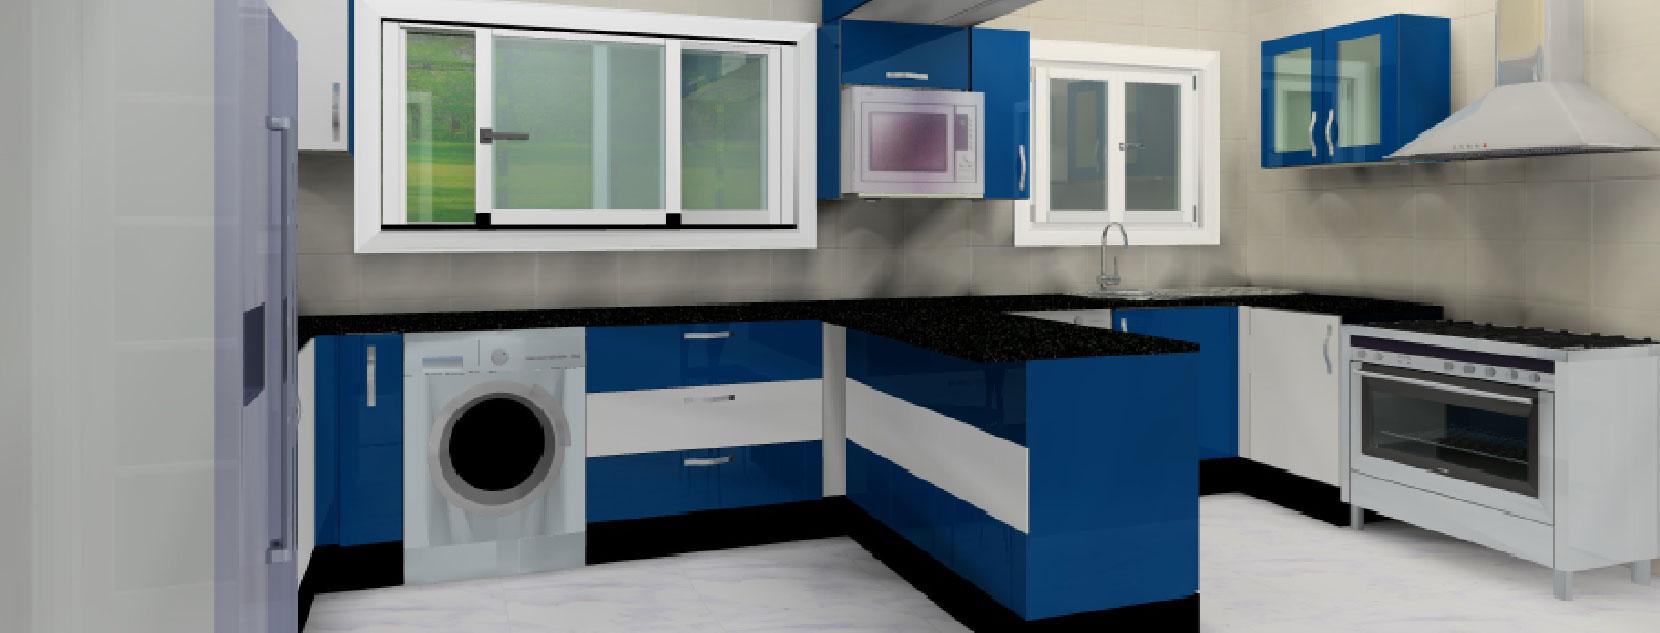 Kitchen Designers In Trivandrum Modular Kitchen Designing Kerala